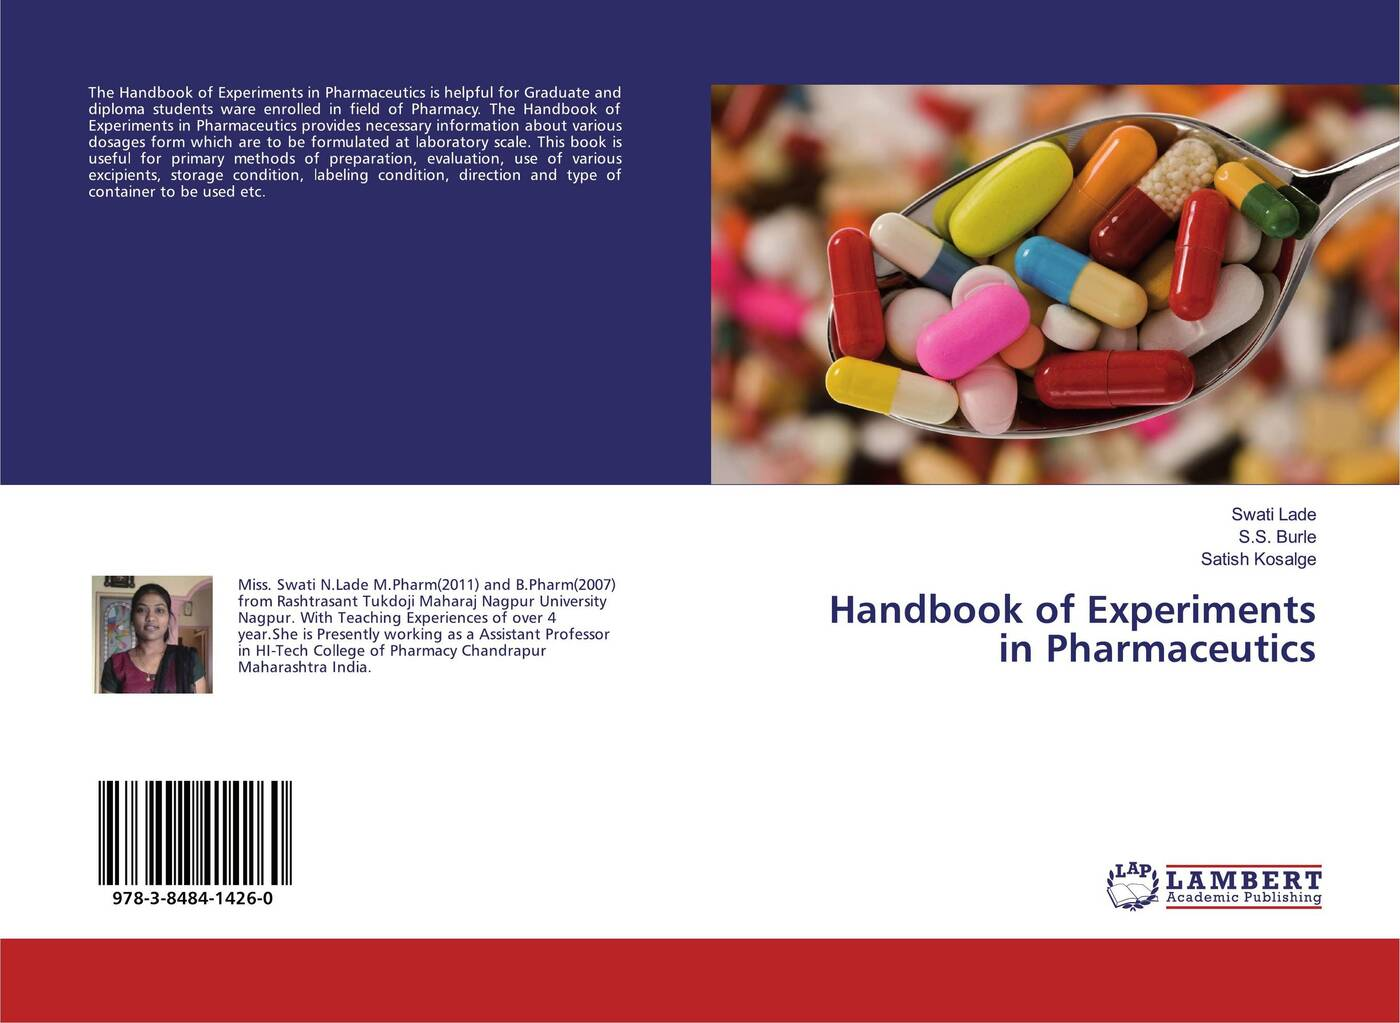 Swati Lade,S.S. Burle and Satish Kosalge Handbook of Experiments in Pharmaceutics цены